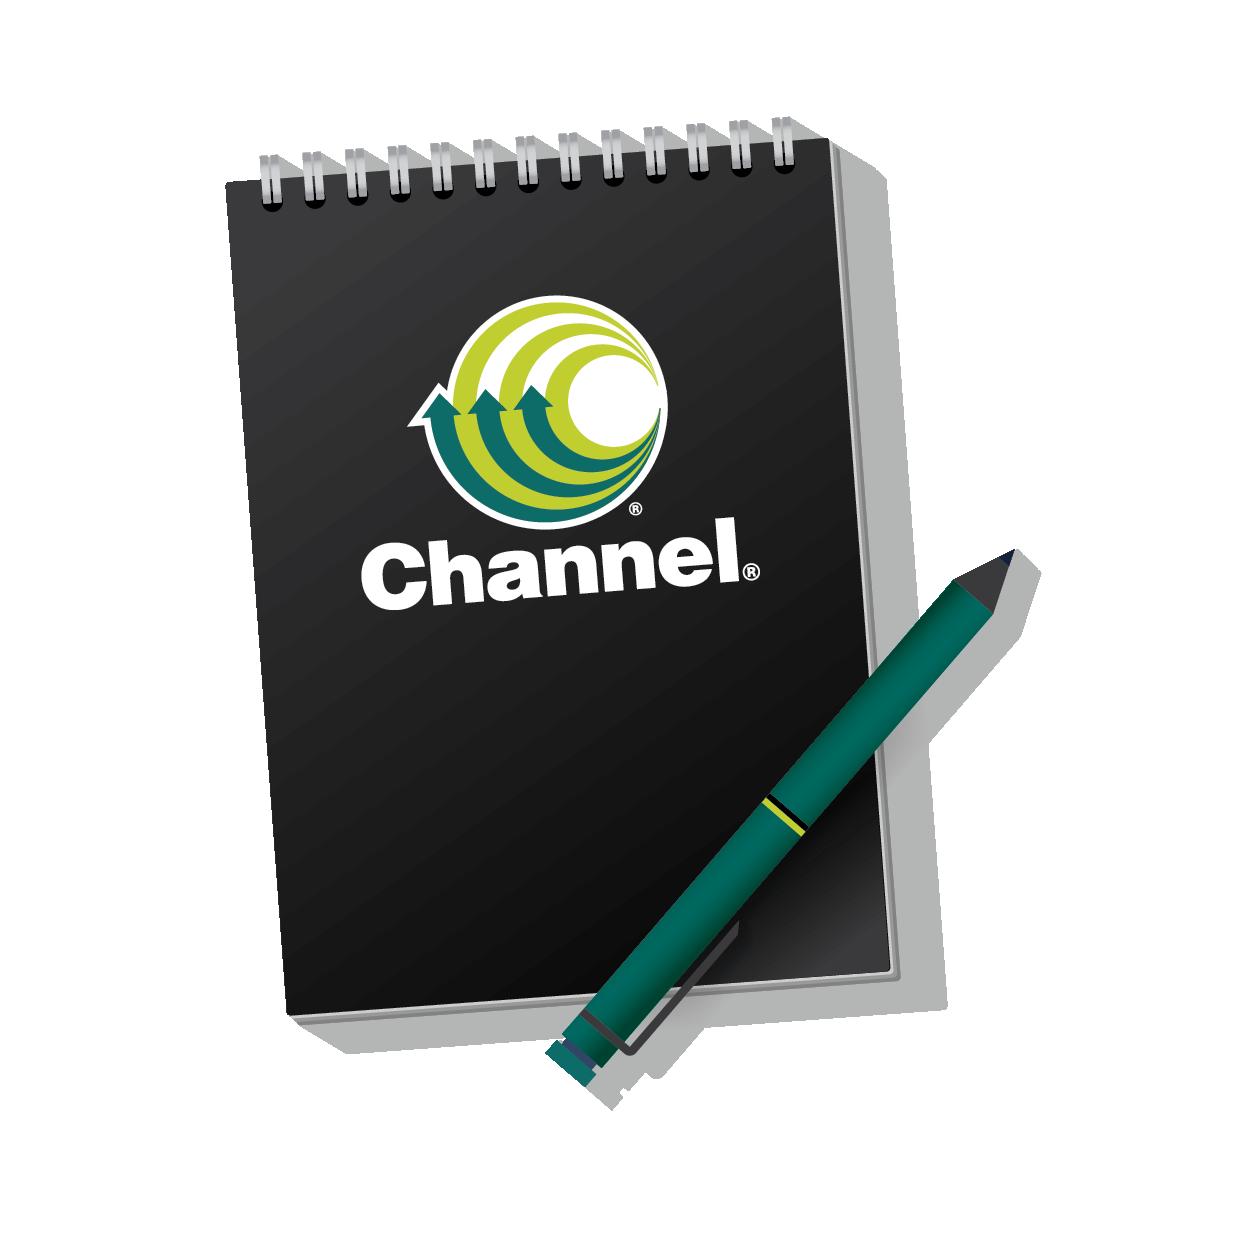 Channel Stickers messages sticker-7